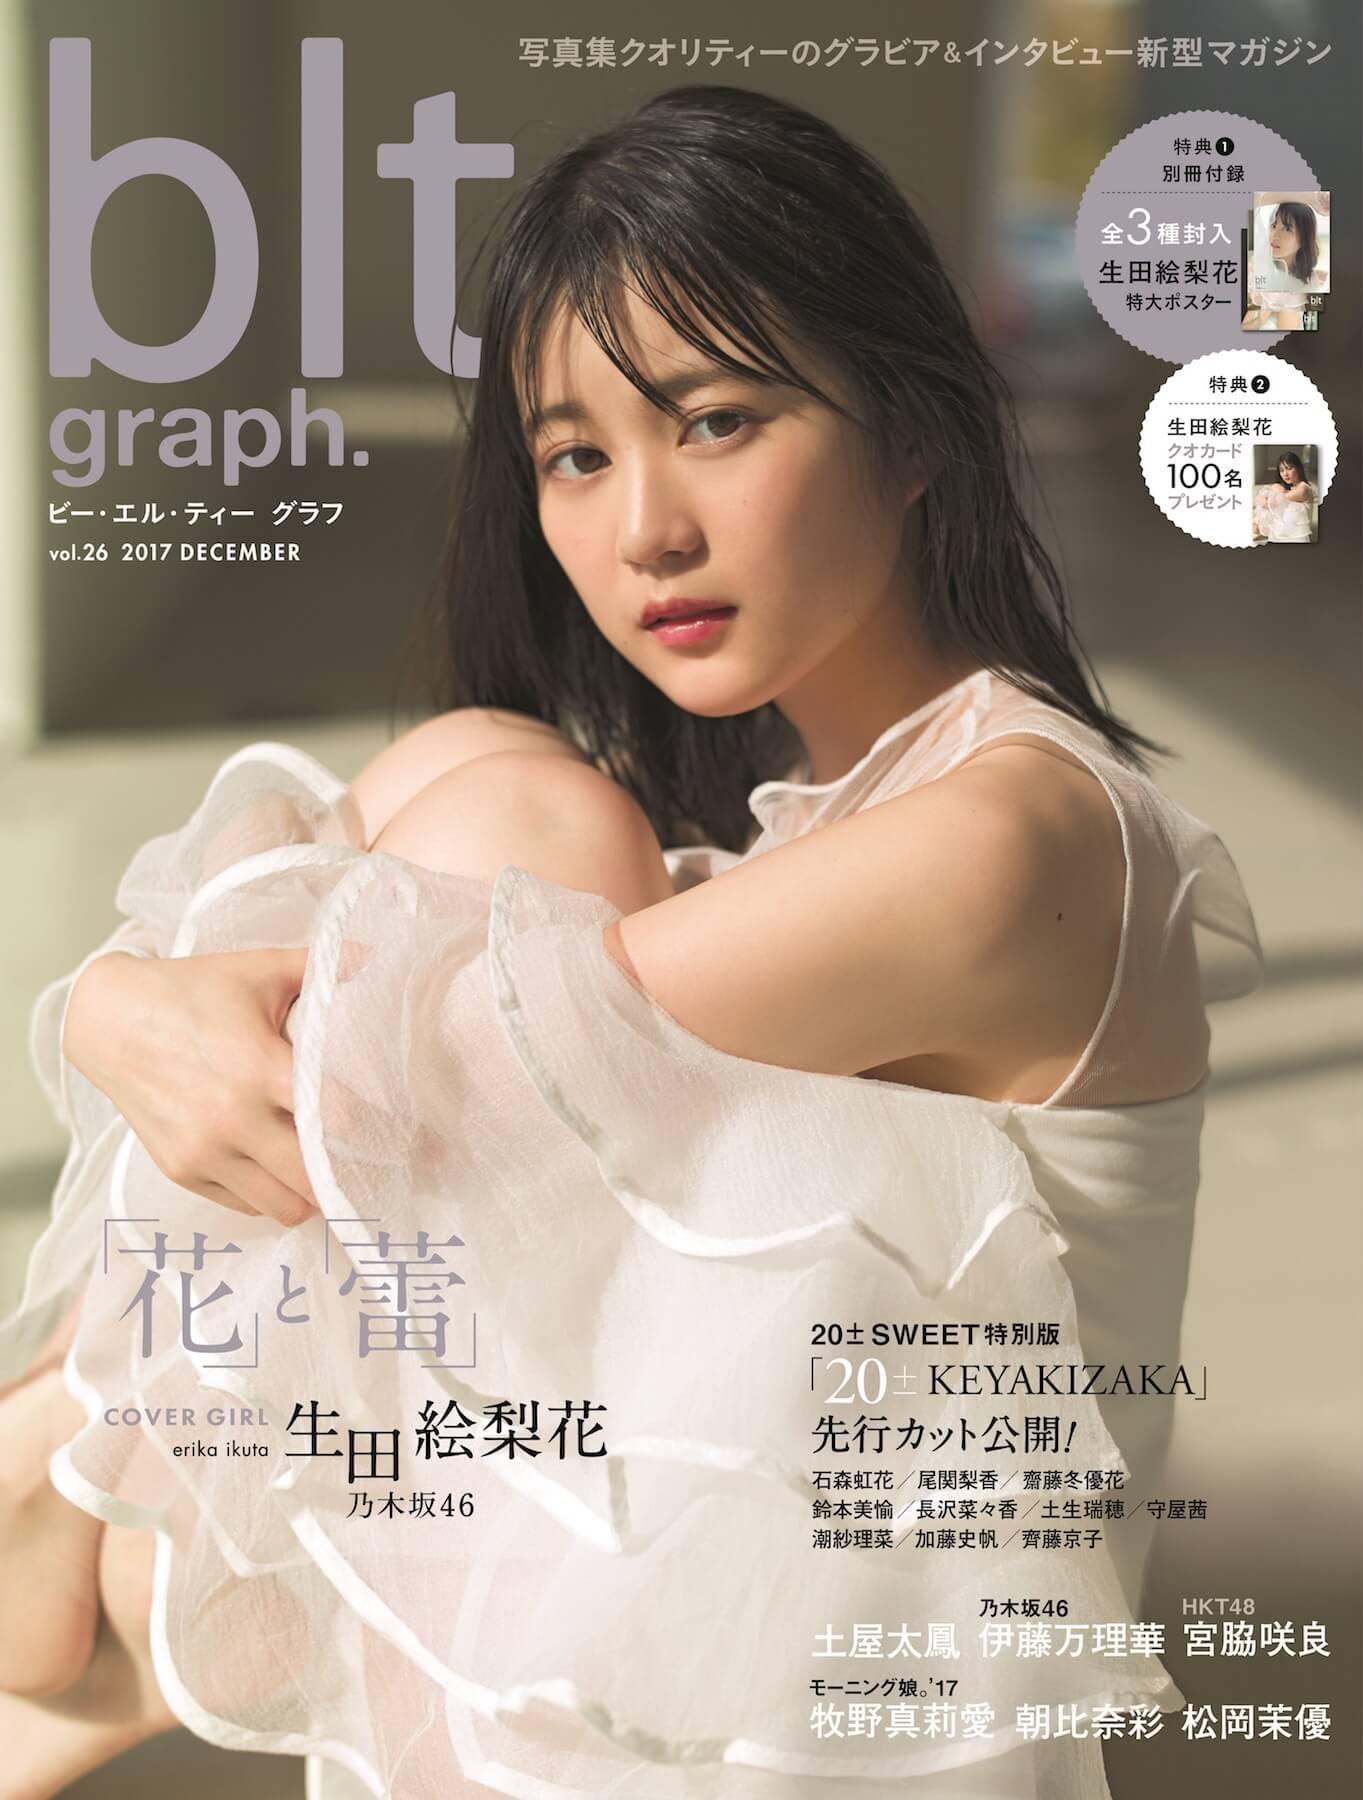 「blt graph.」vol.26(表紙:生田絵梨花/発行:東京ニュース通信社)